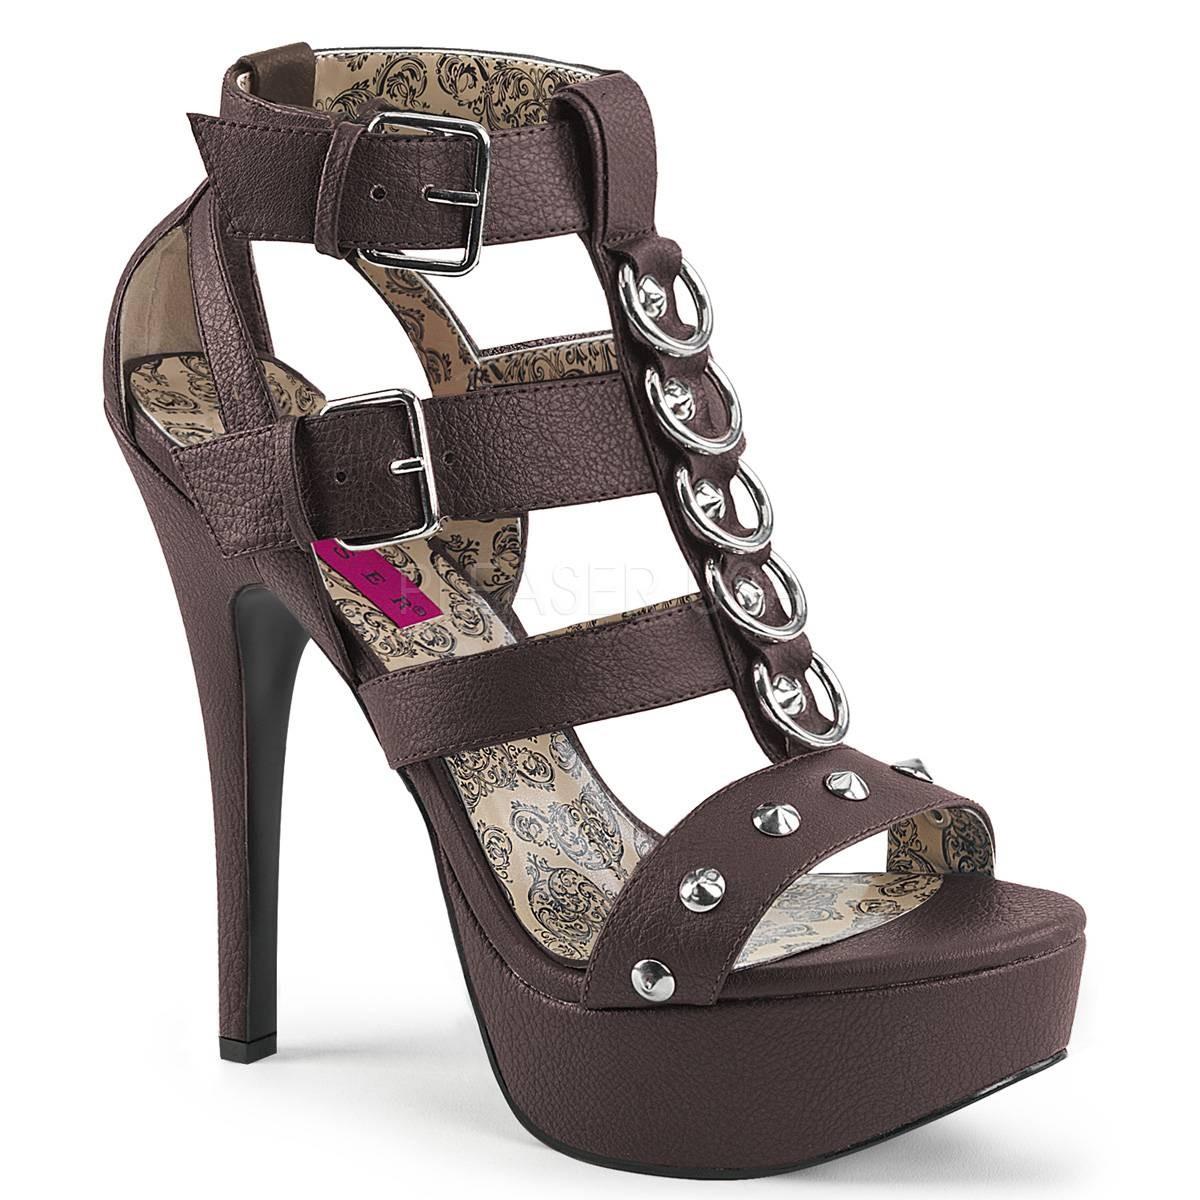 Highheels - TEEZE 42W ° Damen Sandalette ° BraunMatt ° Pleaser Pink Label  - Onlineshop RedSixty